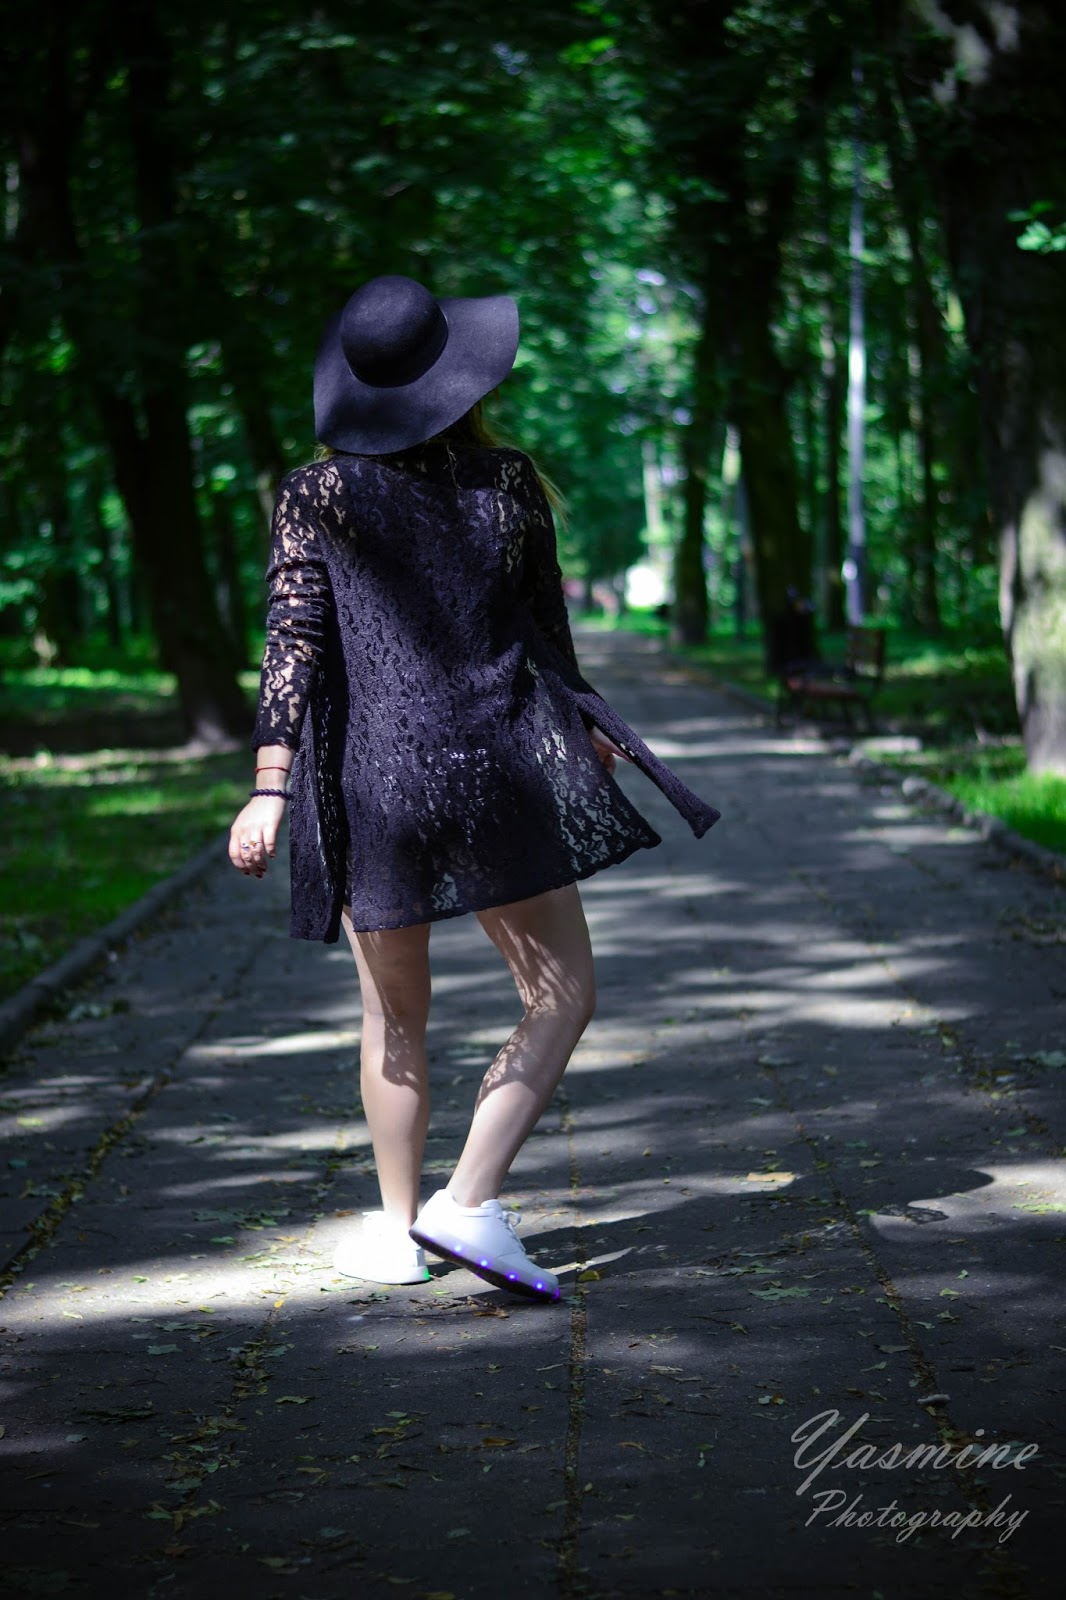 renee shoes lato z renee white sneakers disco lights biale buty z diodami led. style